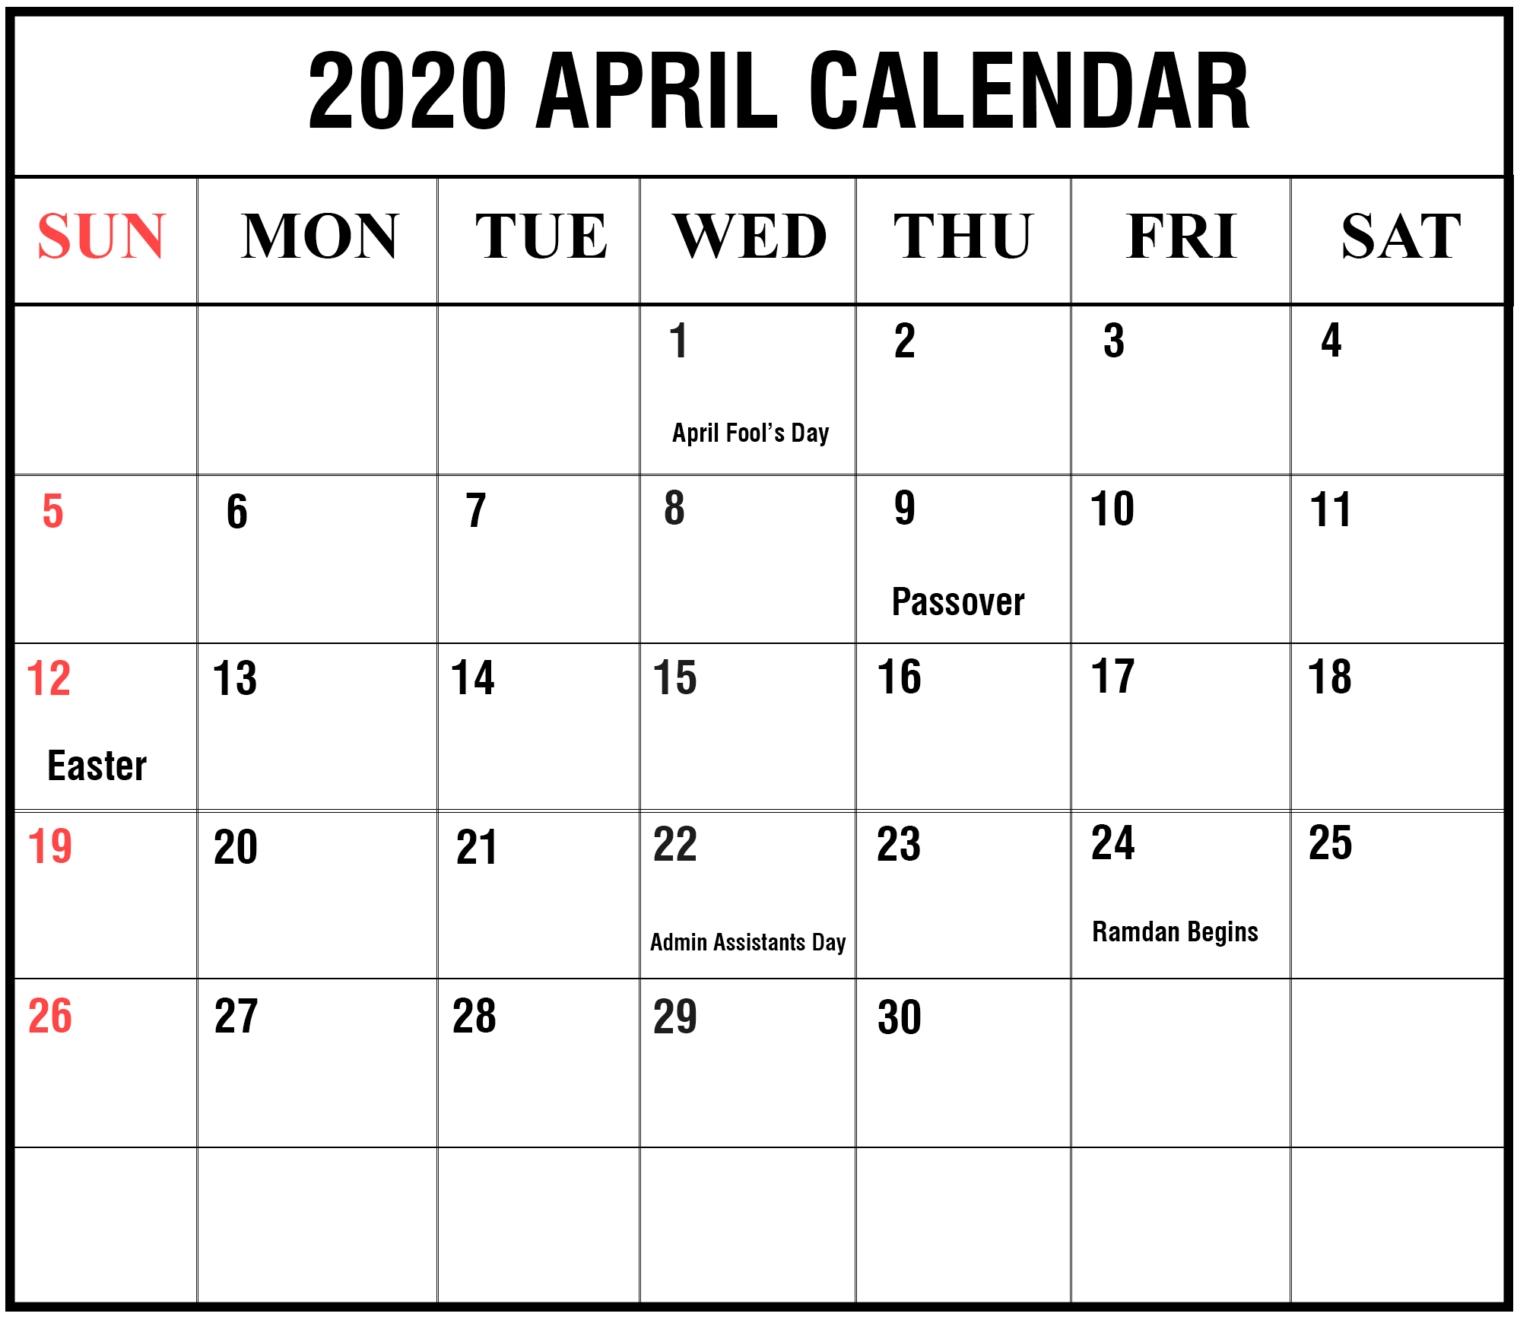 Most Current Images 2020 Calendar April Thoughts, 2020